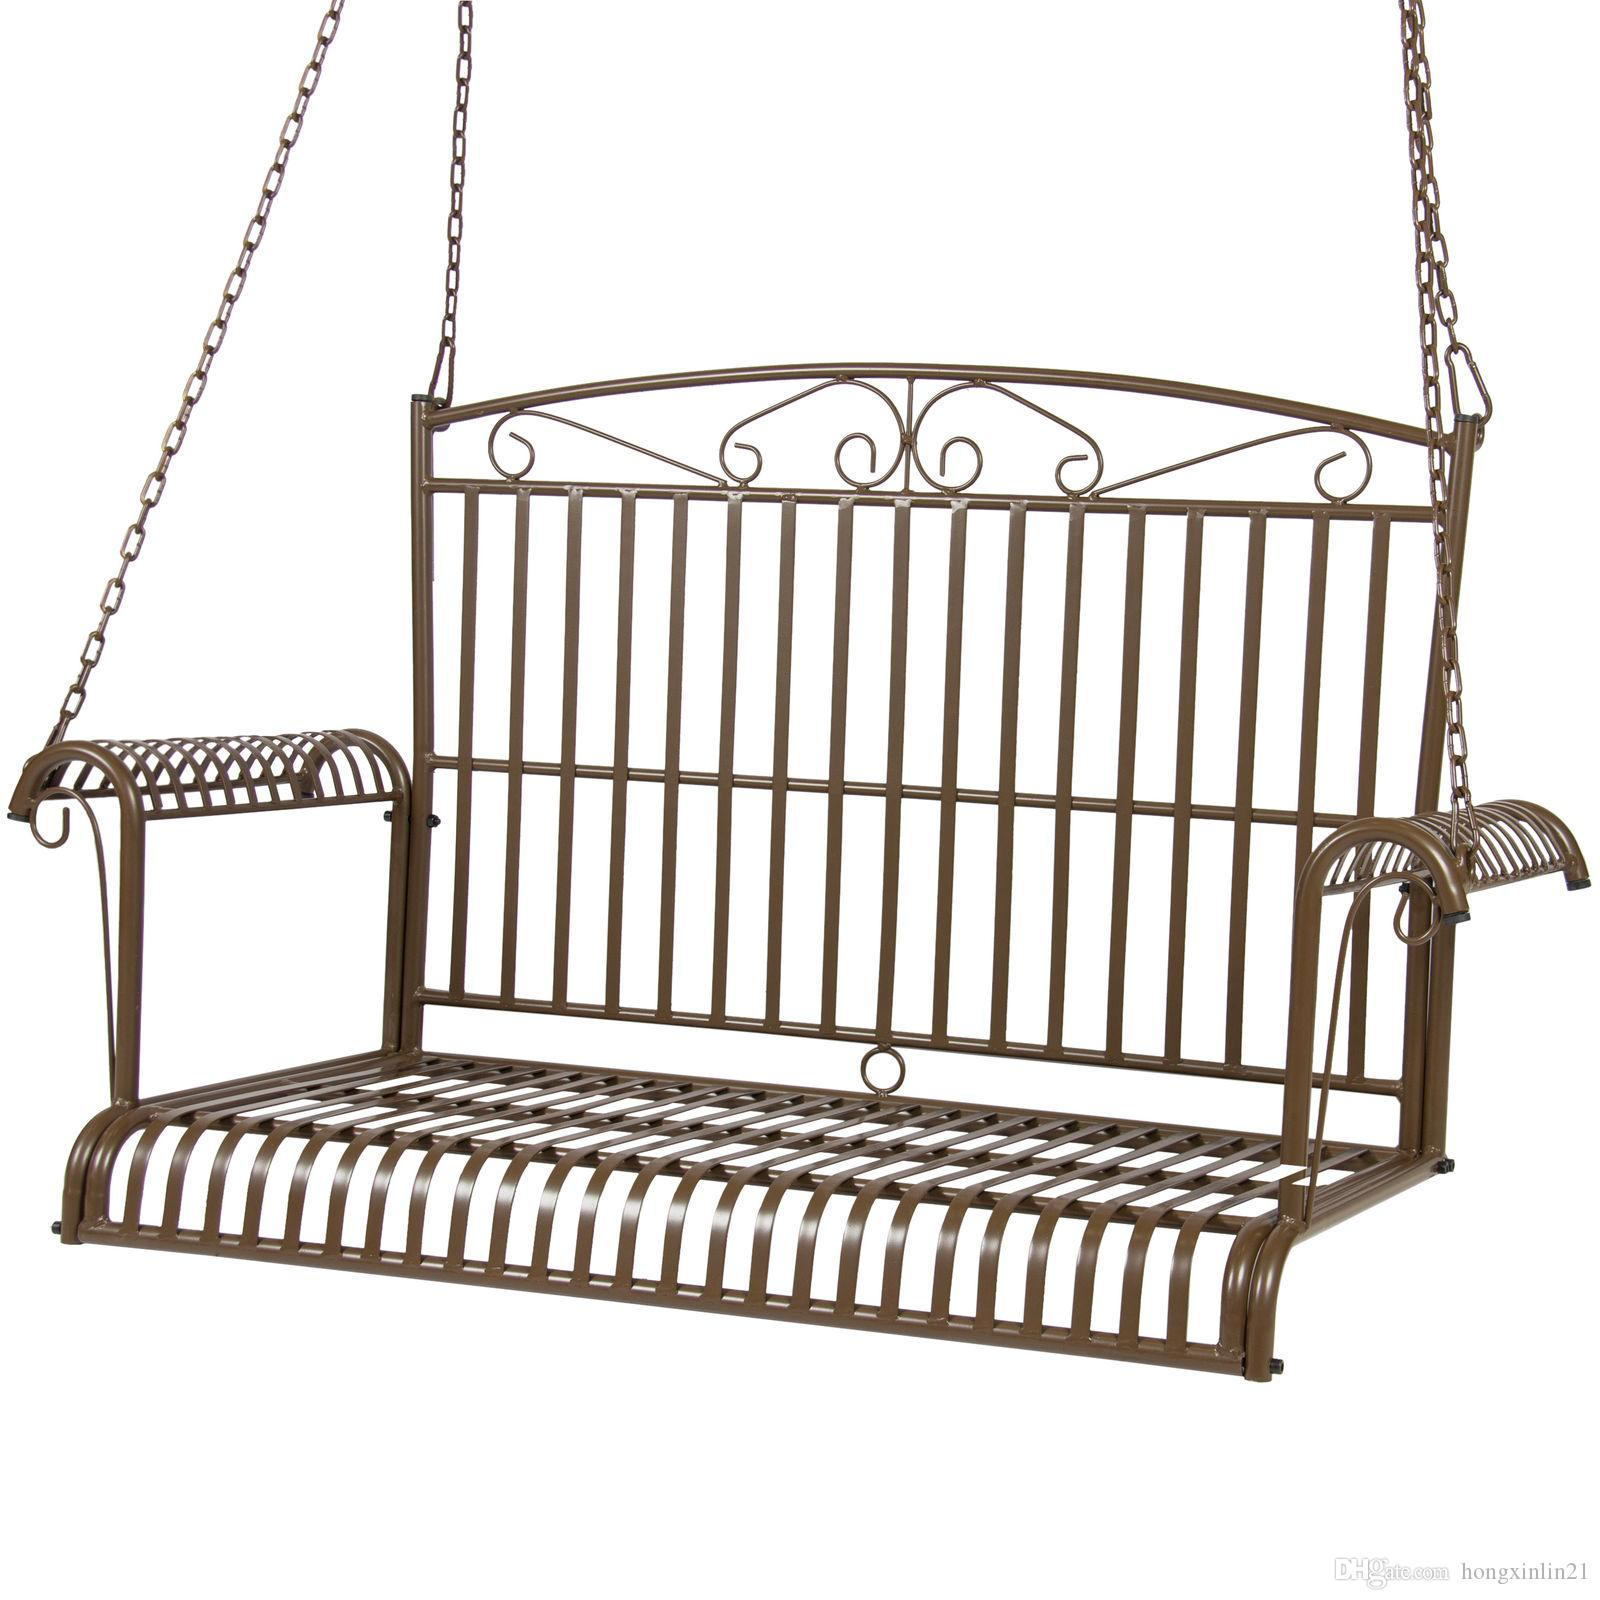 2020 Bcp Iron Patio Hanging Porch Swing Chair Bench Seat Outdoor Furniture From Hongxinlin21 91 45 Dhgate Com